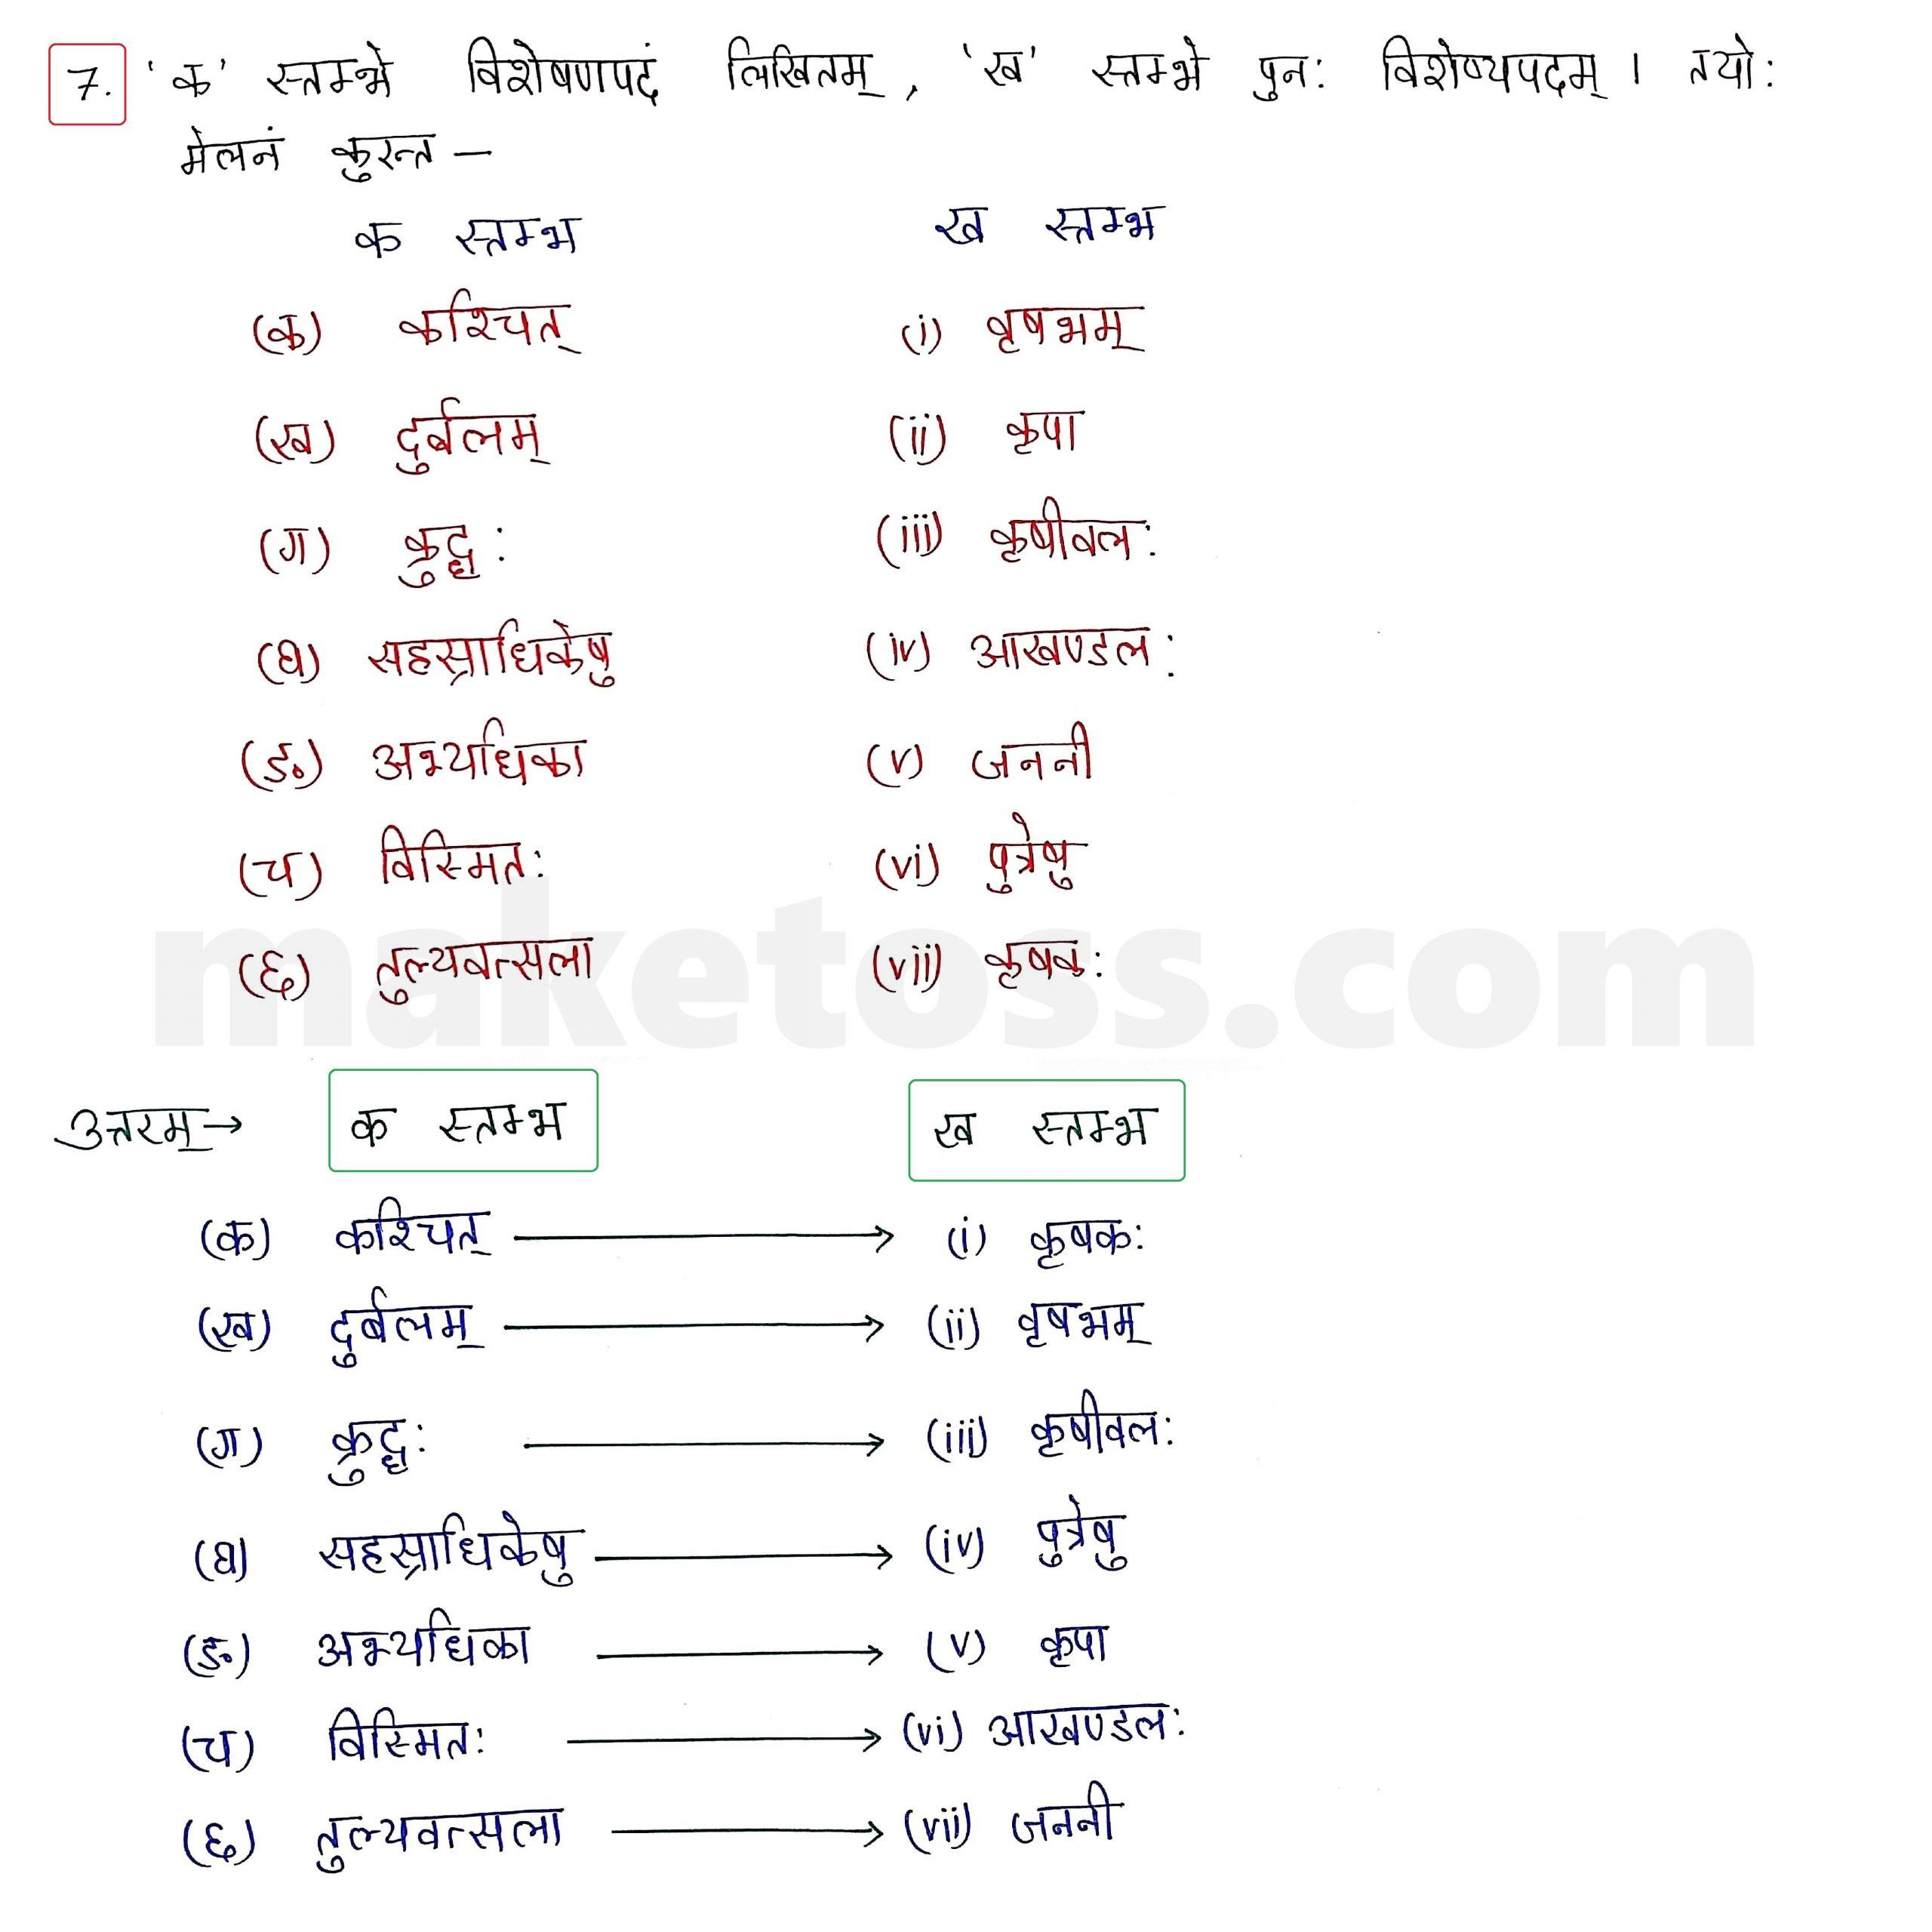 Sanskrit Class 10 - Chapter 5 - जननी तुल्यवत्सला  - Question 7 with Answer